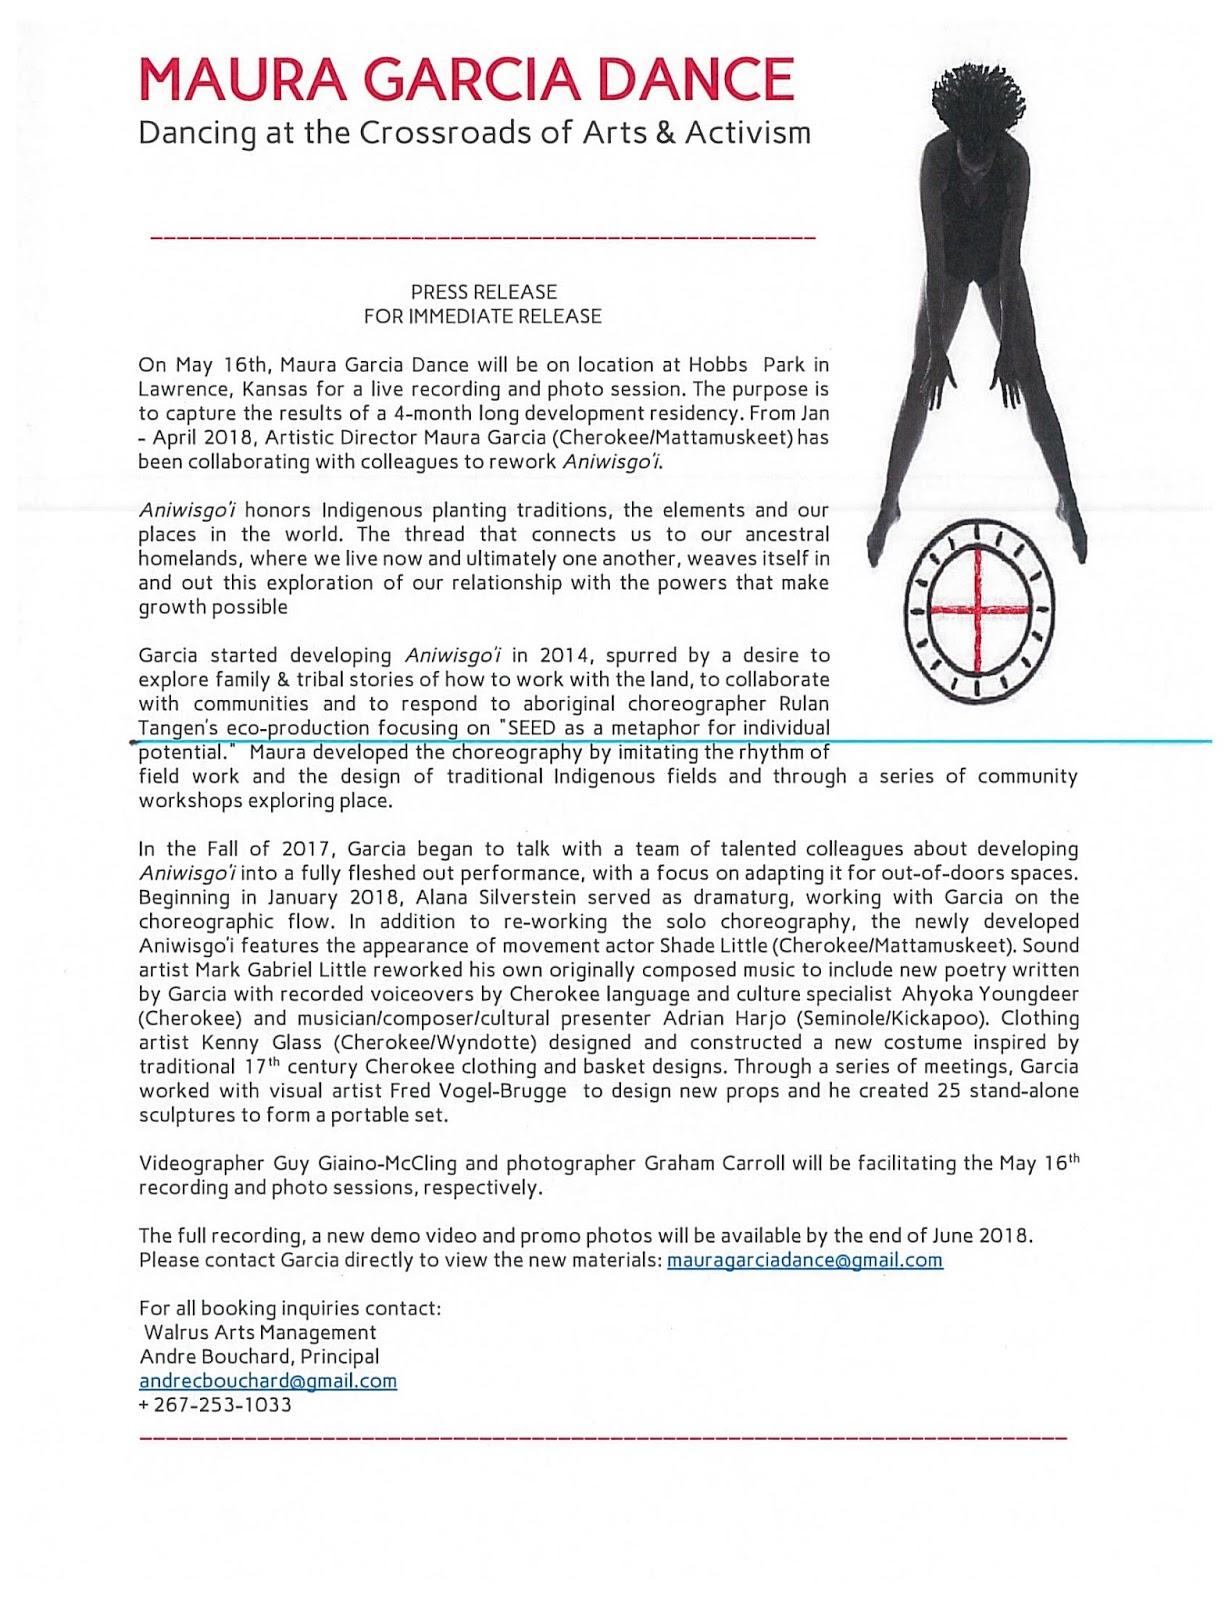 Maura Garcia Dance: Press Releases